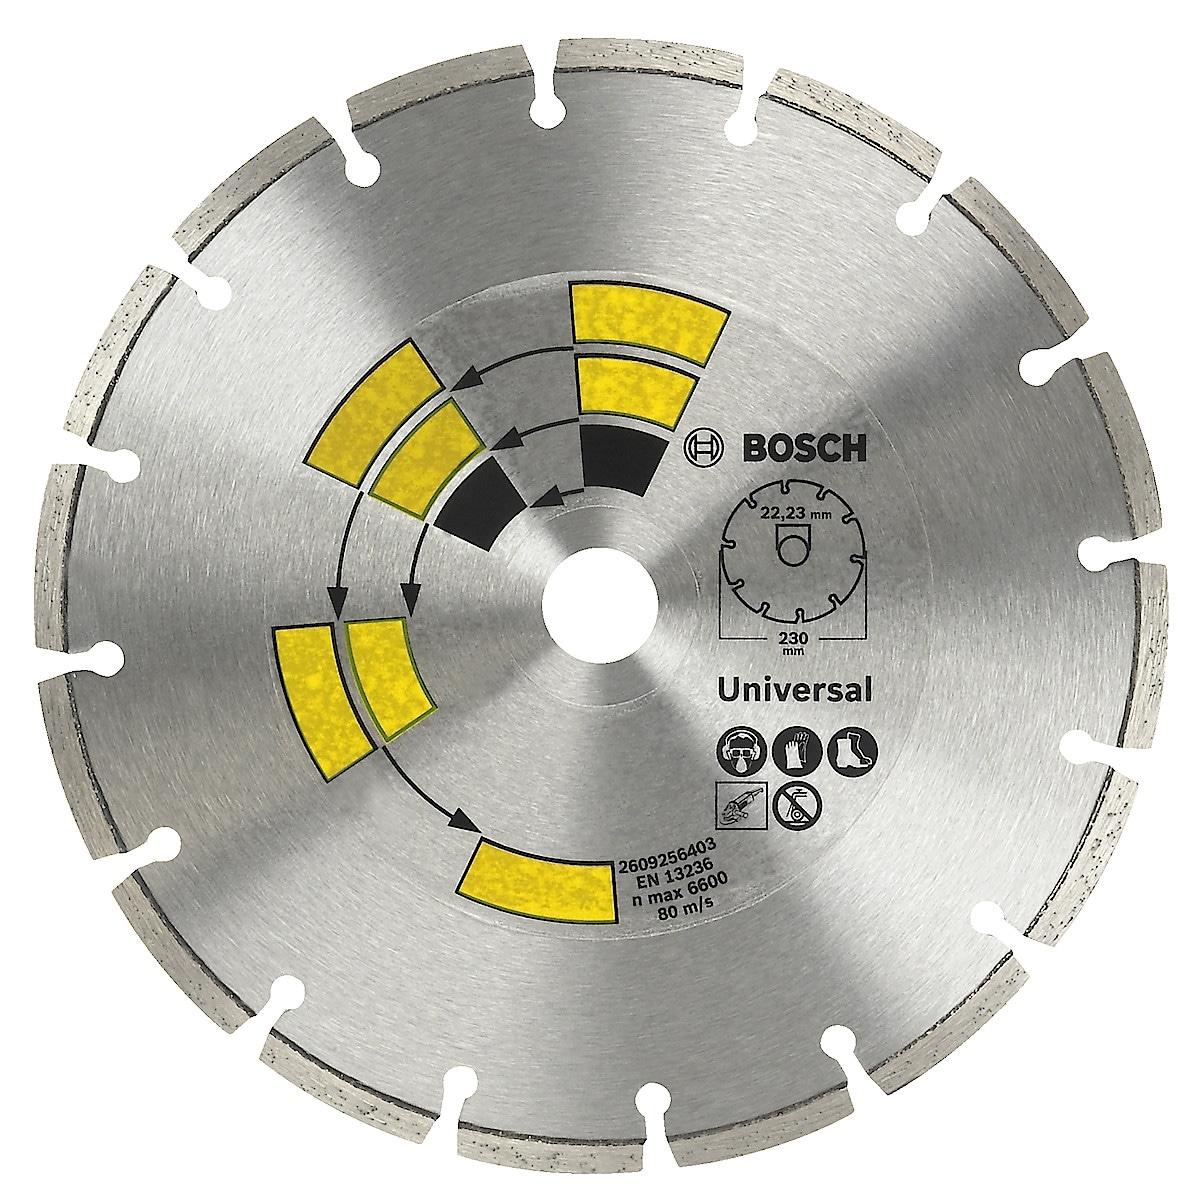 Diamantkapskiva universal 125 mm Bosch